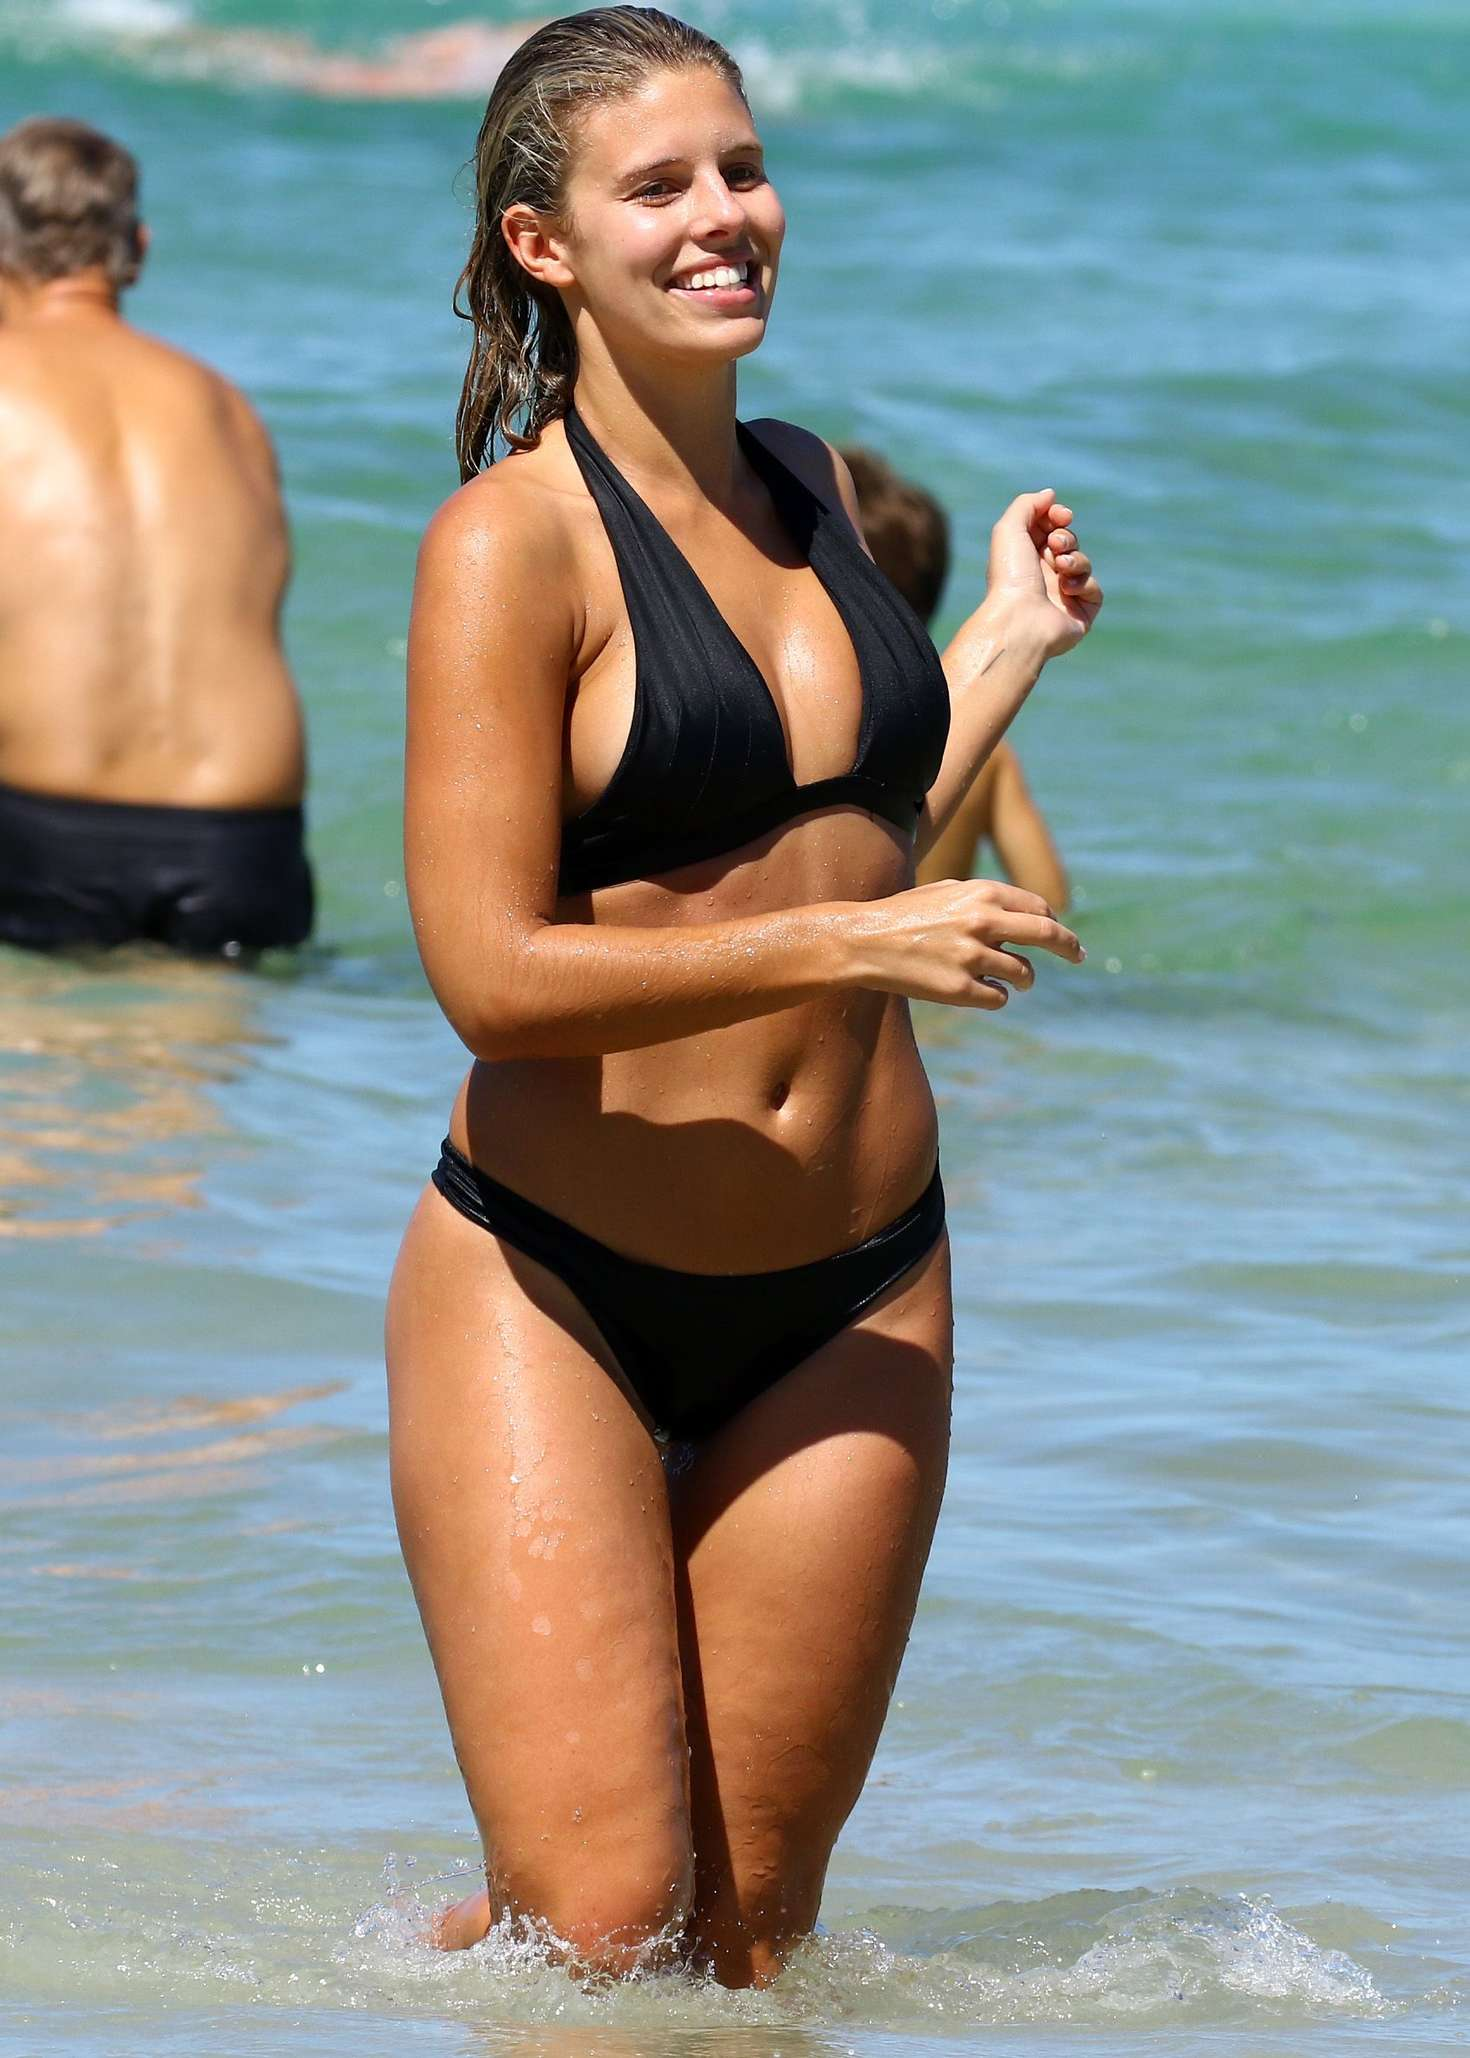 Tits Hot Natasha Oakley naked photo 2017